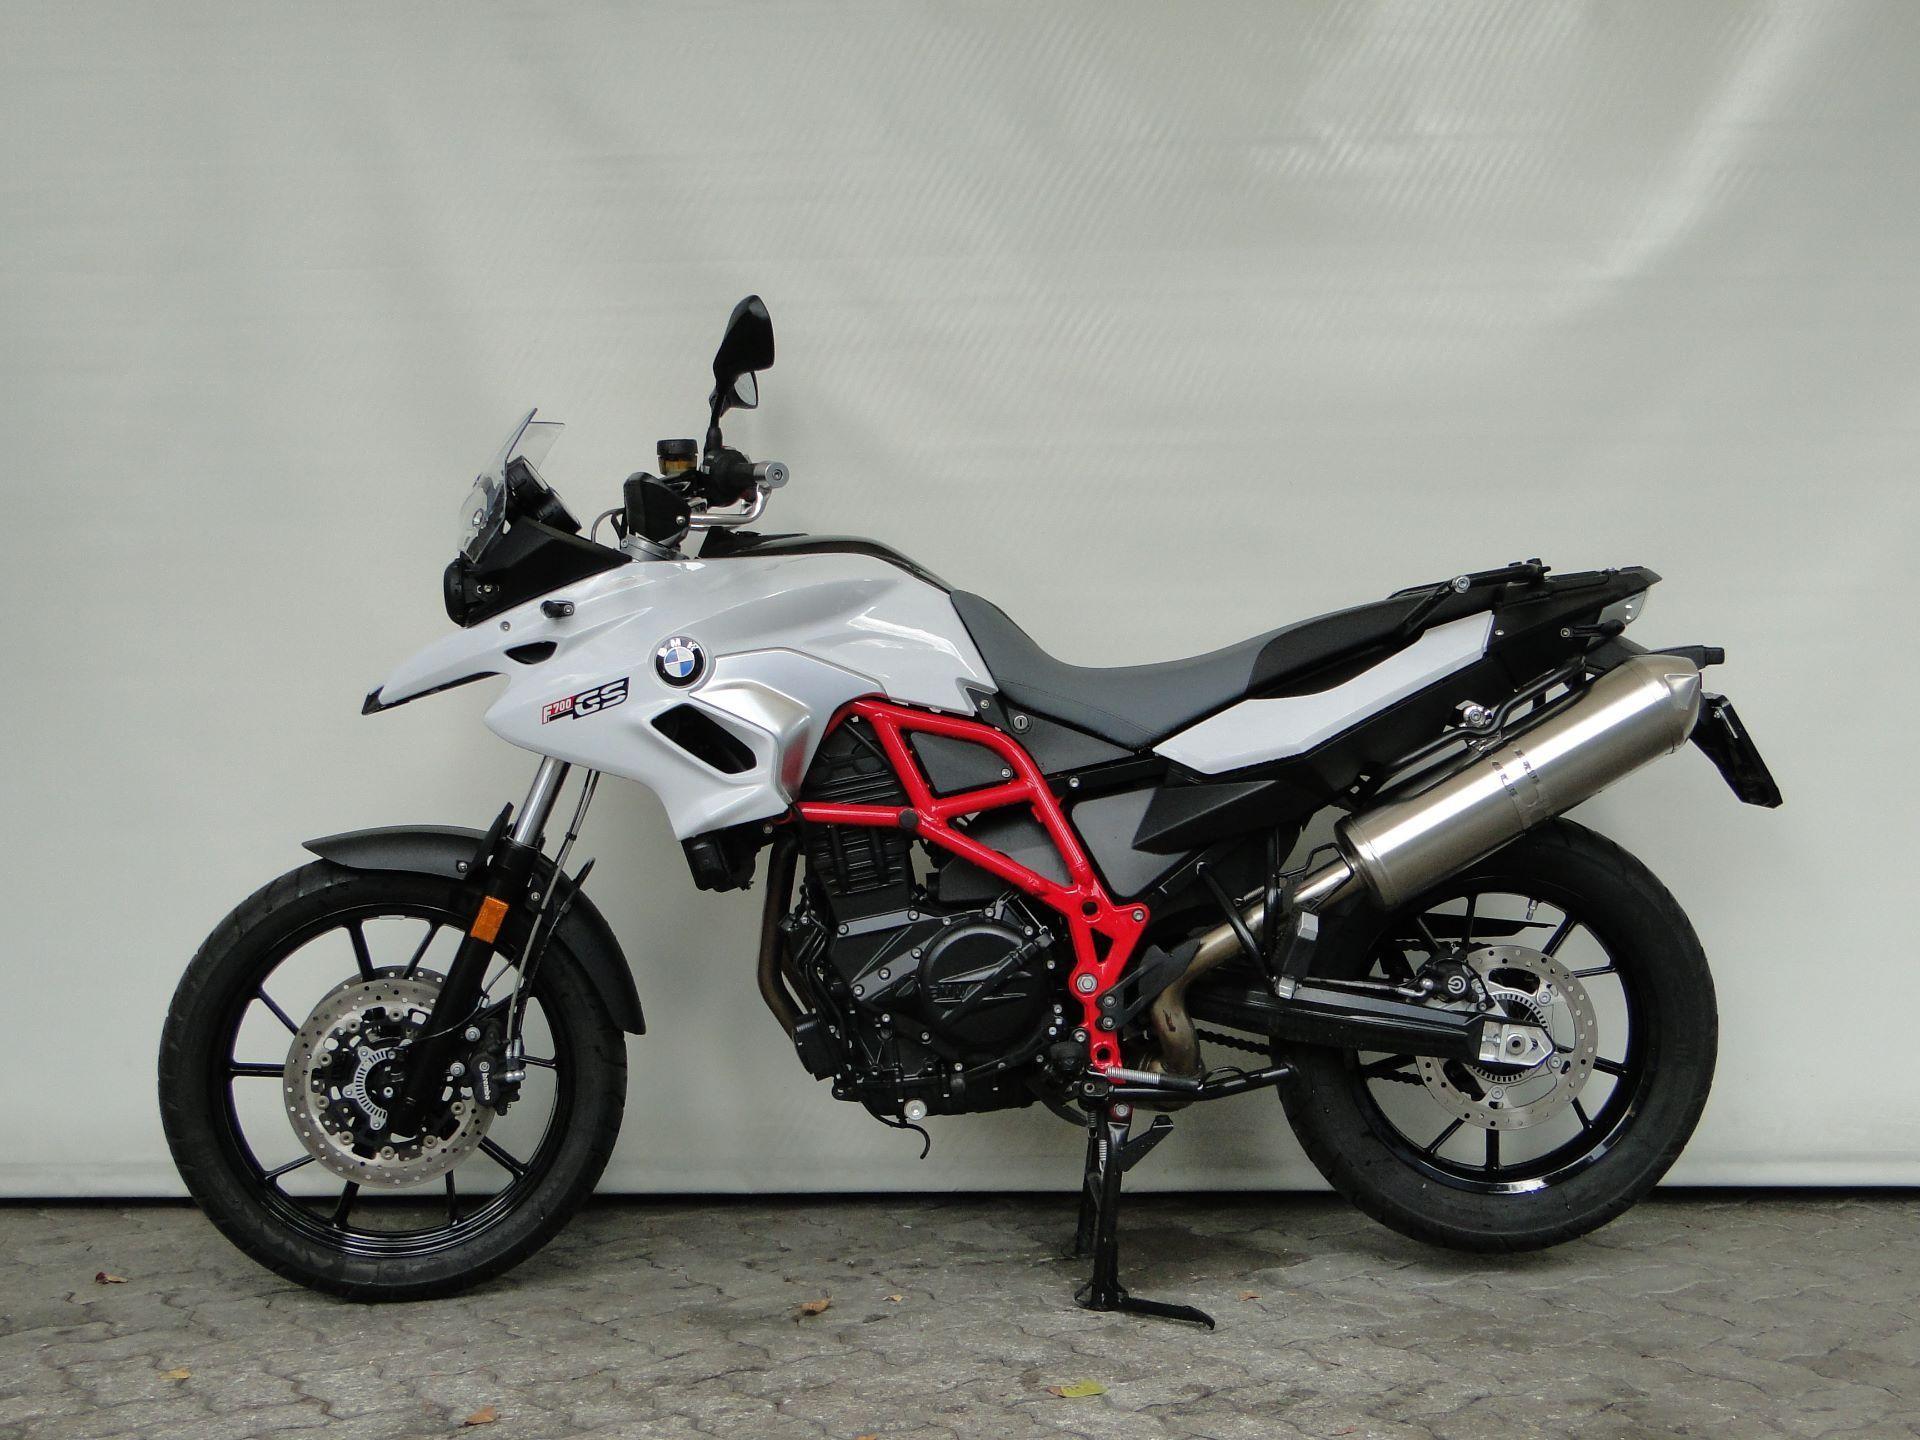 moto occasions acheter bmw f 700 gs abs 35kw hobi moto ag winterthur. Black Bedroom Furniture Sets. Home Design Ideas